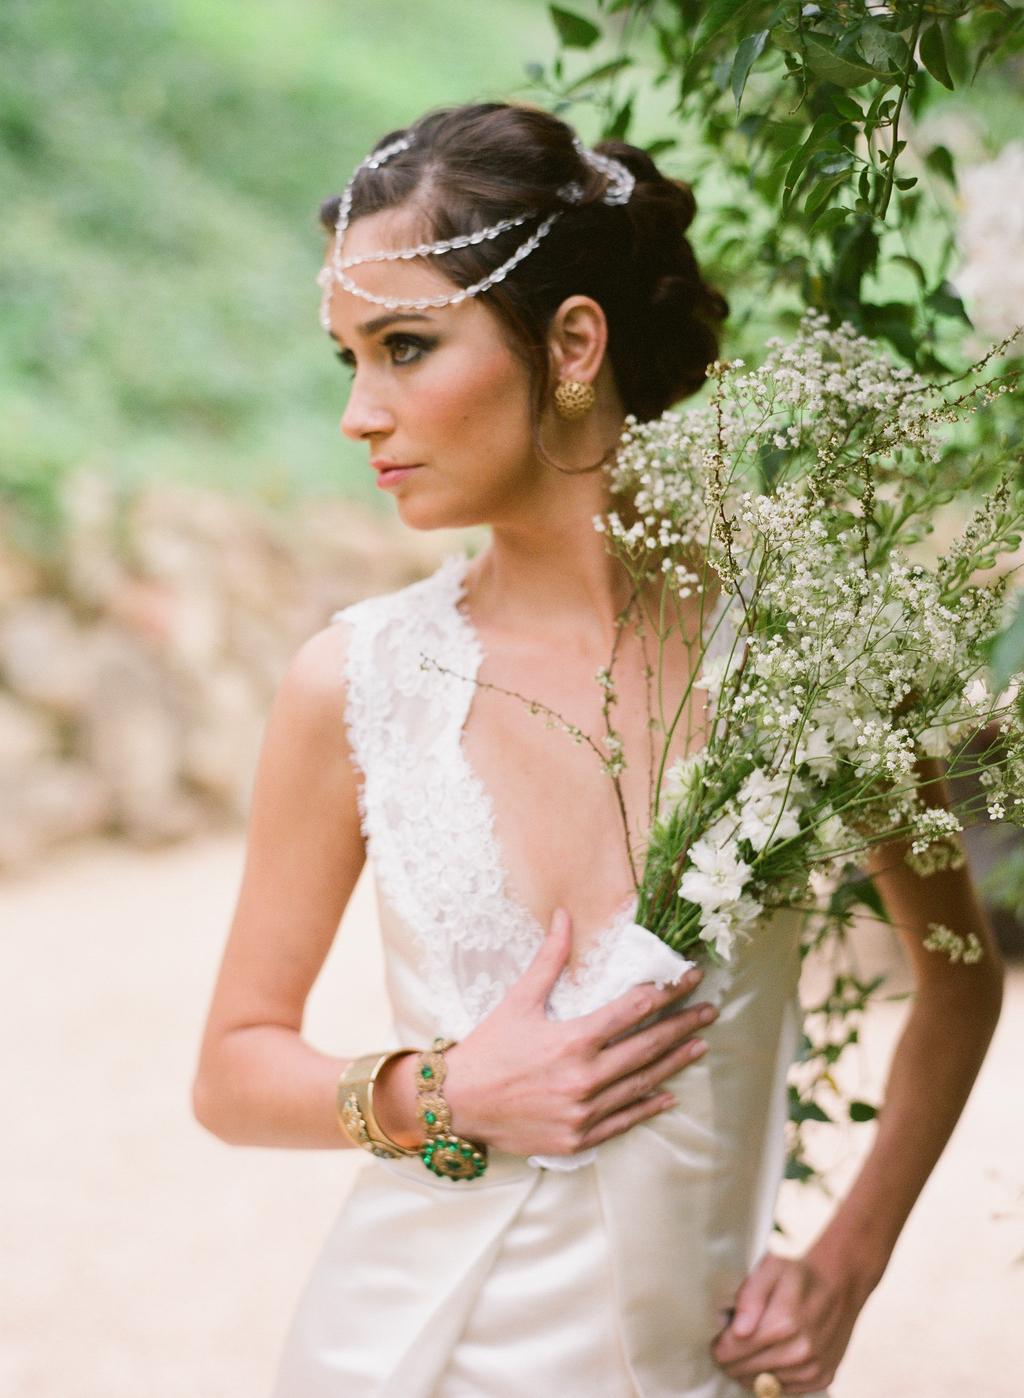 Styled-wedding-santa-barbara-chic-beaux-arts-photographie-italian-bohemian-wedding-bride-wedding-dress-lace-white-flowers-bouquet-030.full